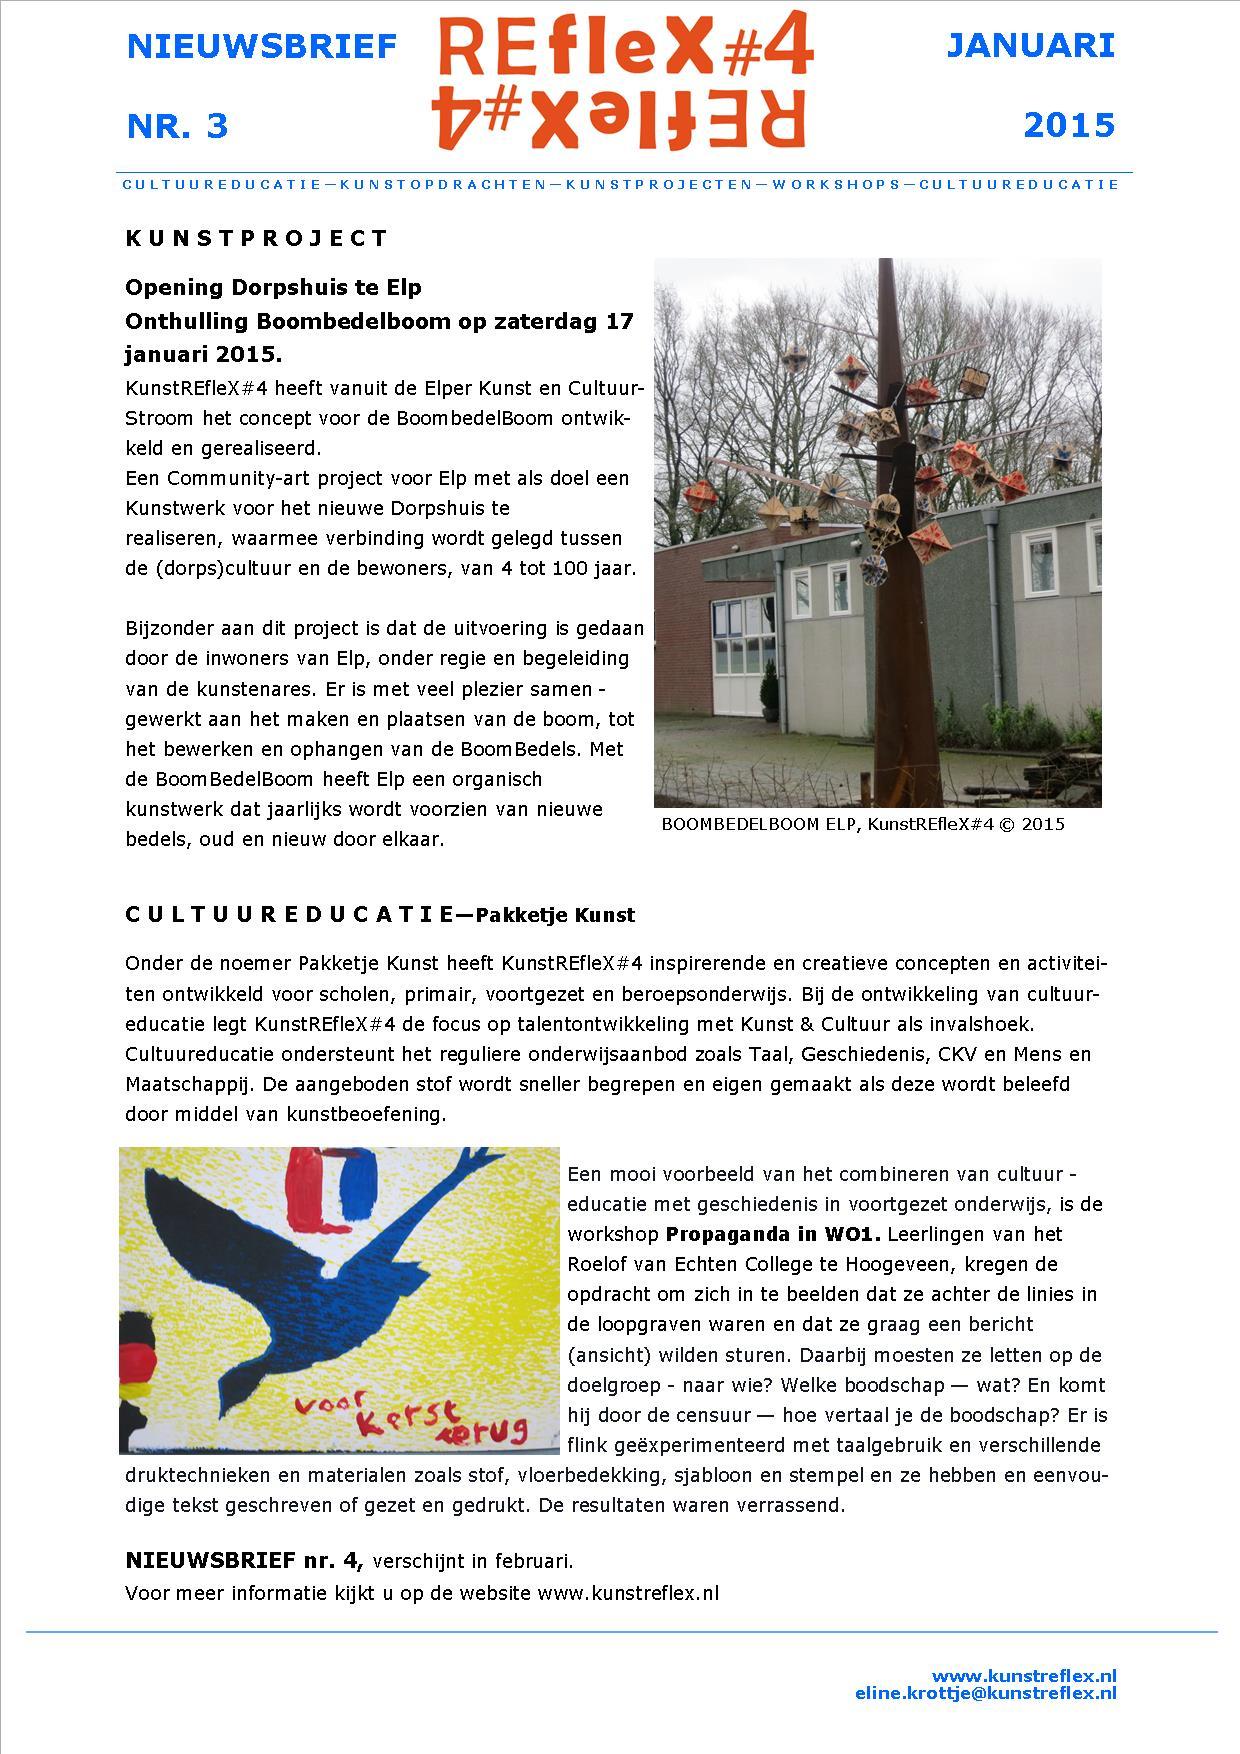 Nieuwsbrief KunstREfleX#4, nr 3